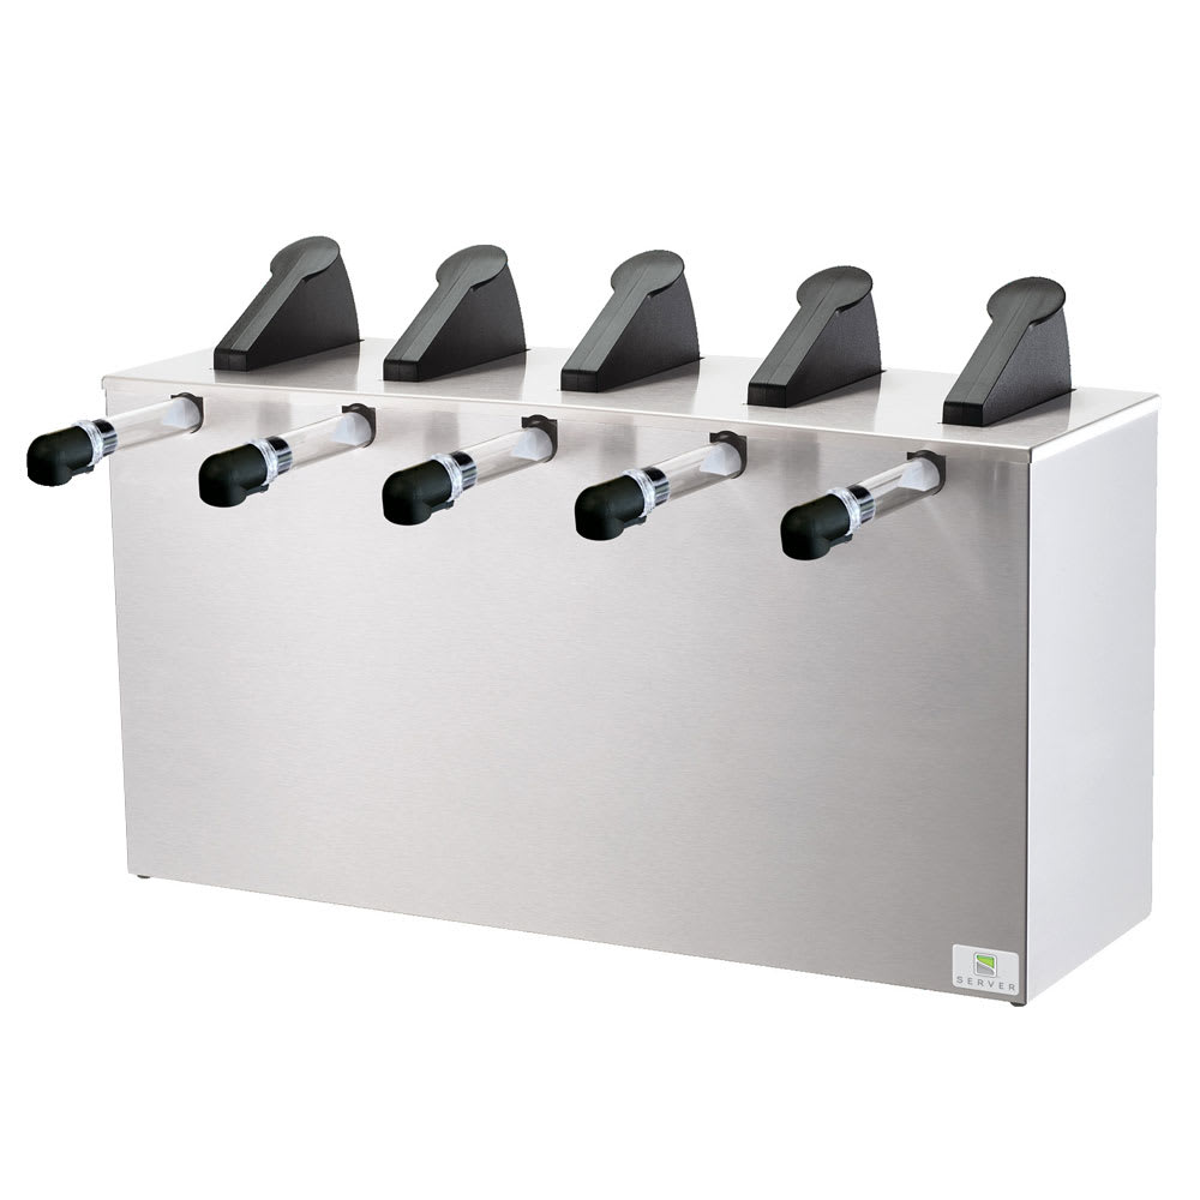 Server 07060 SE-5 Server Express, 5 Pumps, SS Base & Lid, 1 oz. Yield, NSF